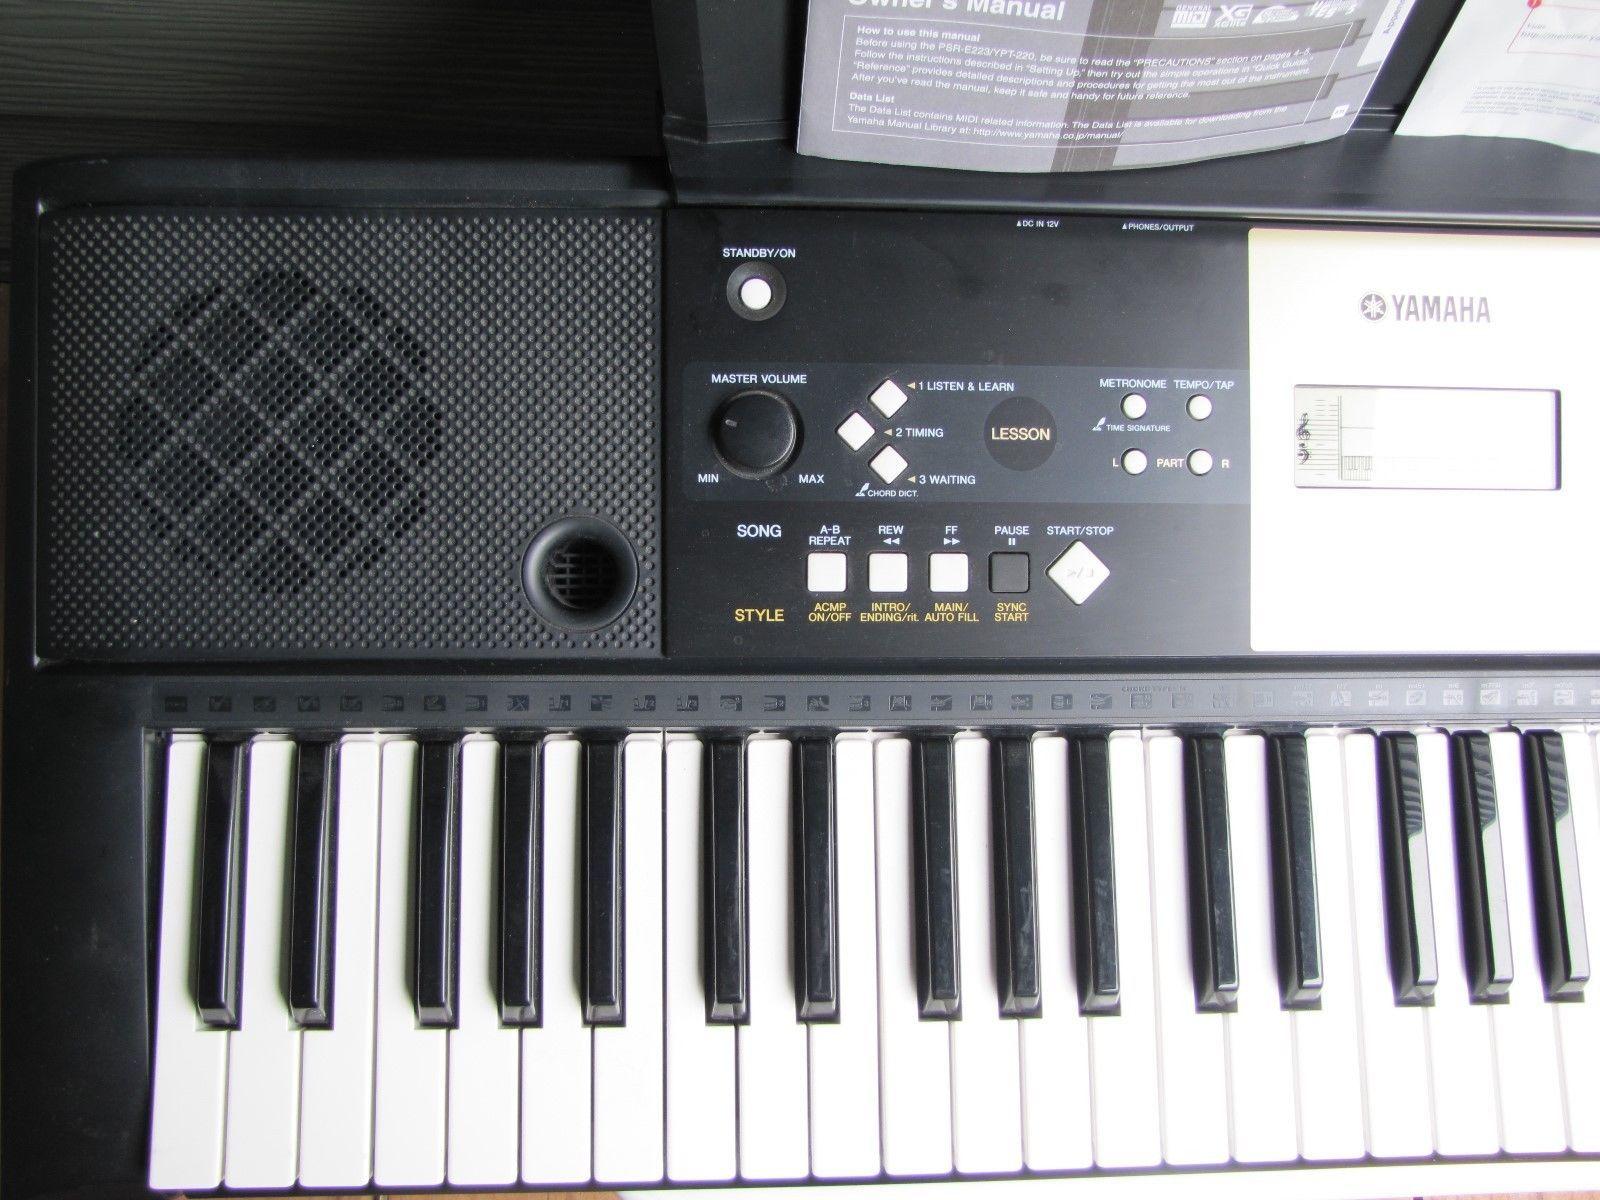 yamaha electronic keyboard model ypt 220 iob and 50 similar items rh bonanza com Manual Guide Furnithure Manual